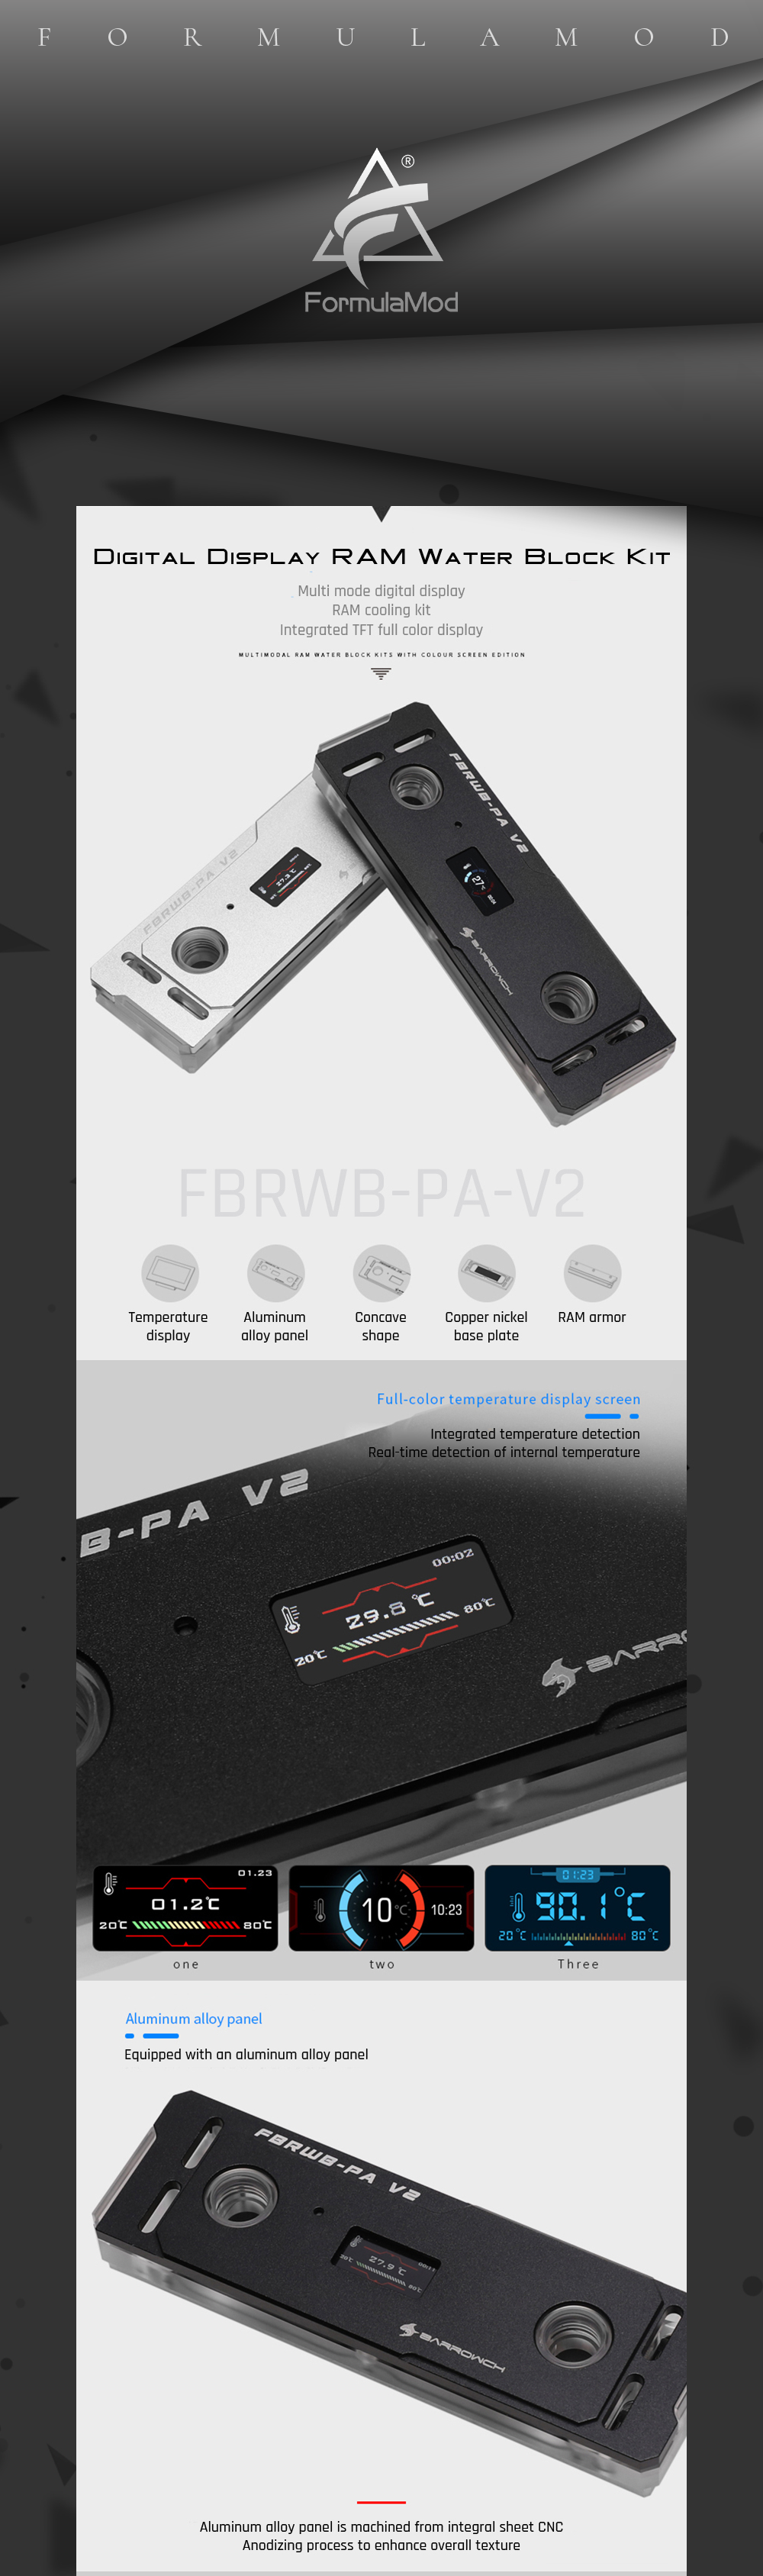 Barrowch FBRWB-PA-V2, RAM Water Blocks/Kits, LRC 2.0 (5v 3pin) Lighting, Standard With RAM Cooling Armors.